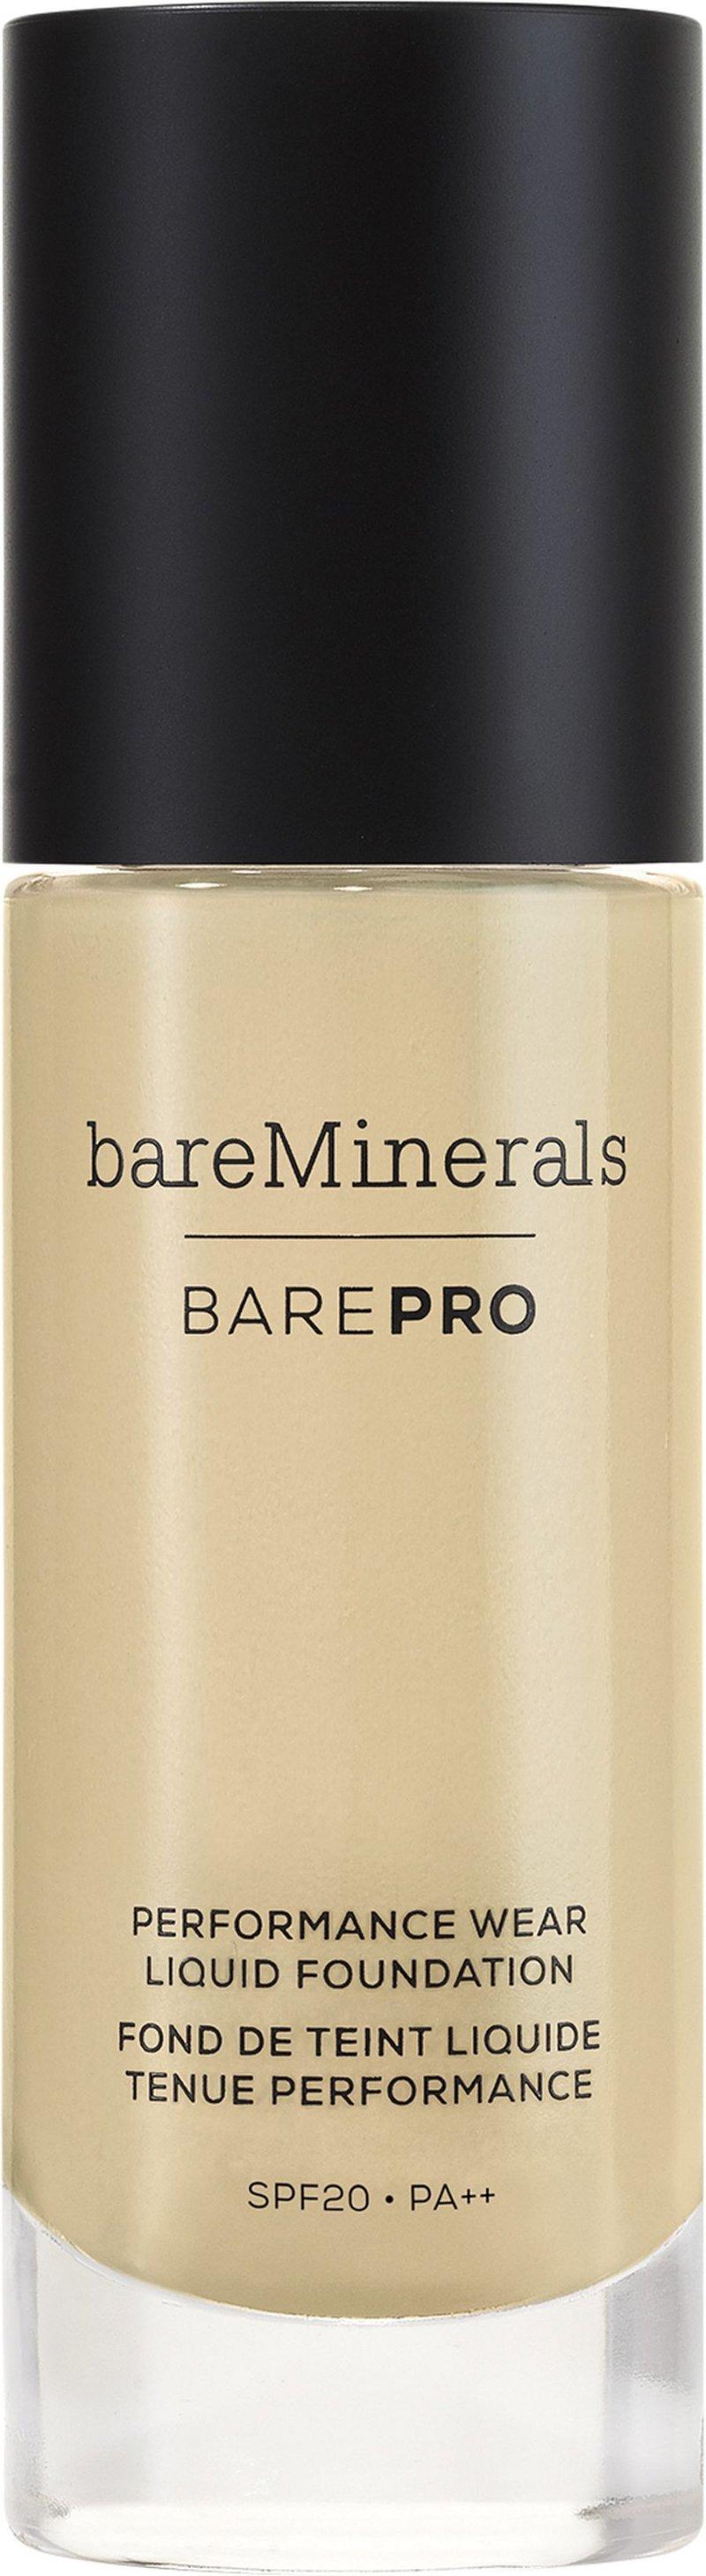 Image of   Bareminerals Foundation - Barepro Performance Wear Liquid - Silk 14